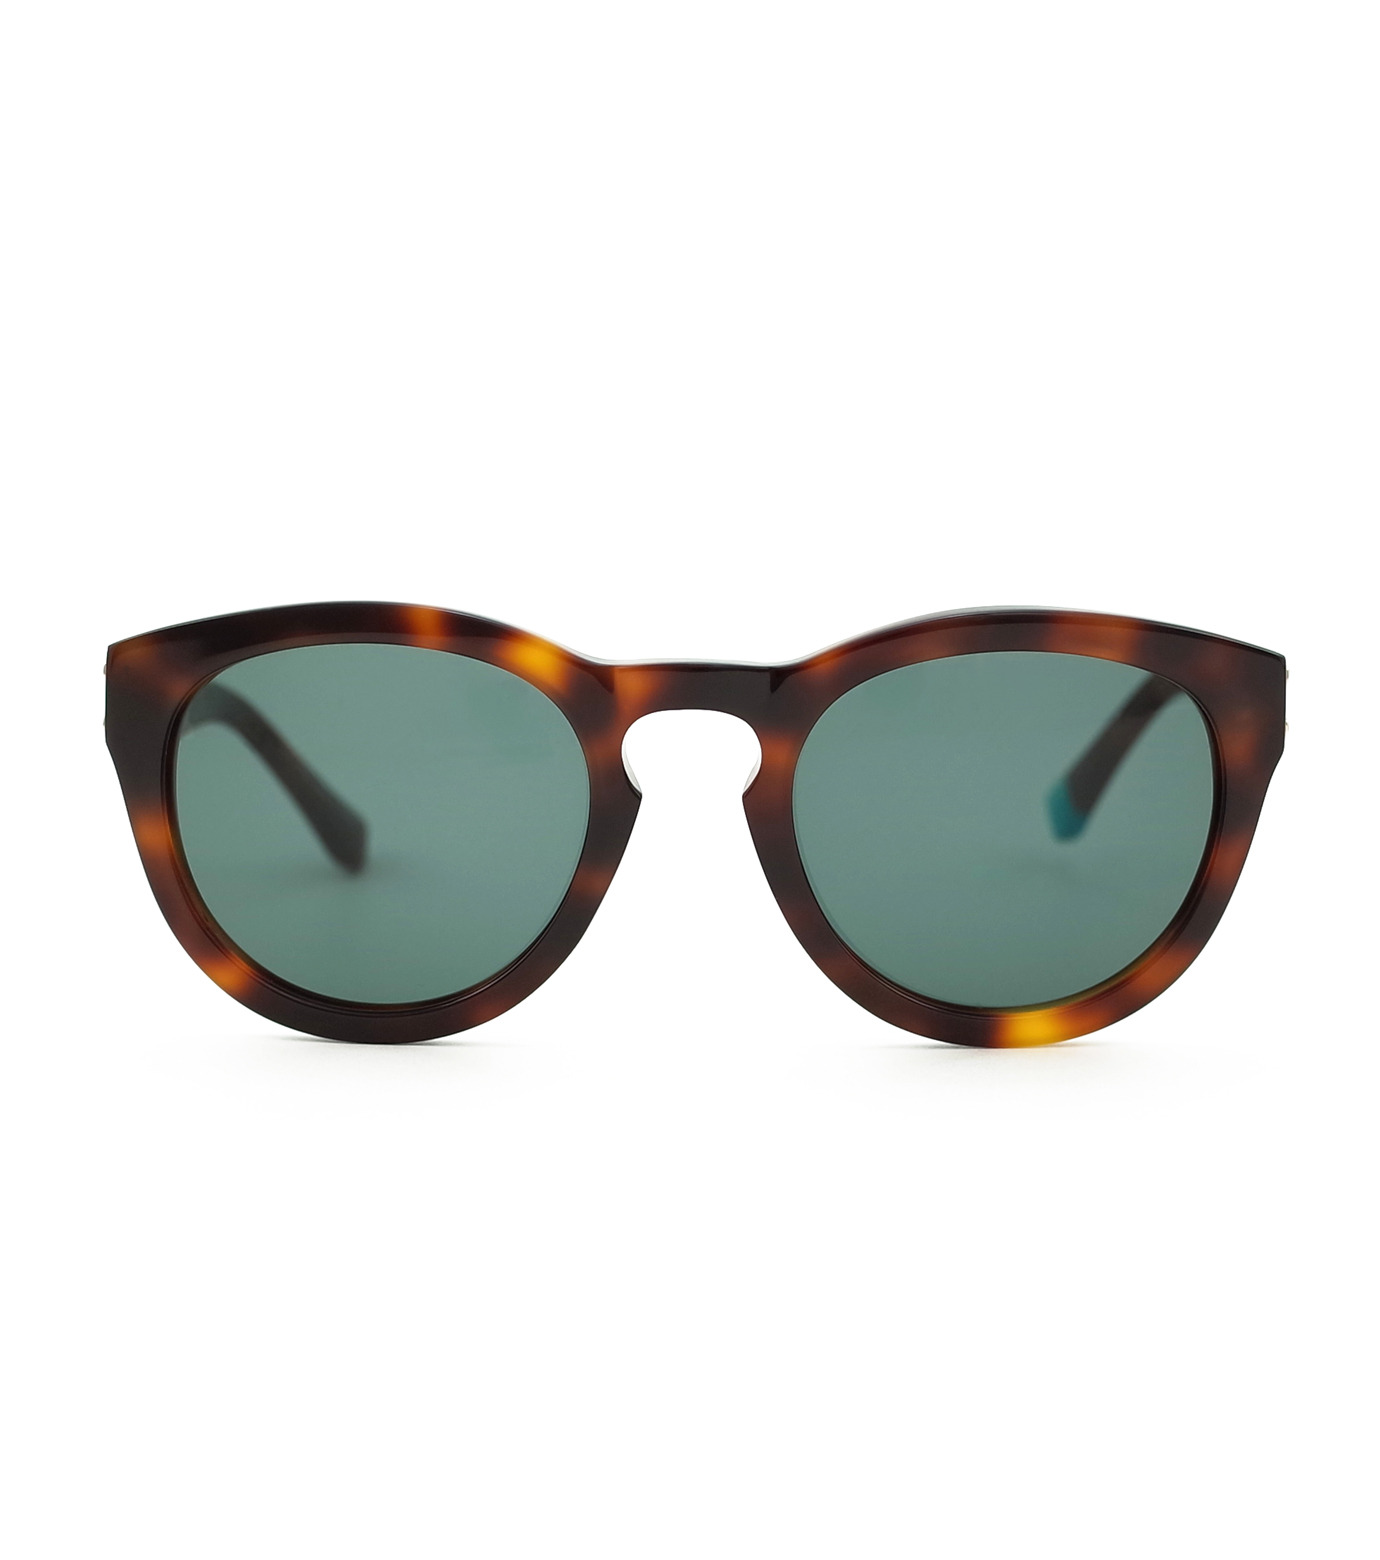 BLANC(ブラン)のThick Frame Sunglass-BROWN(アクセサリー/accessory)-B0007-42 拡大詳細画像2